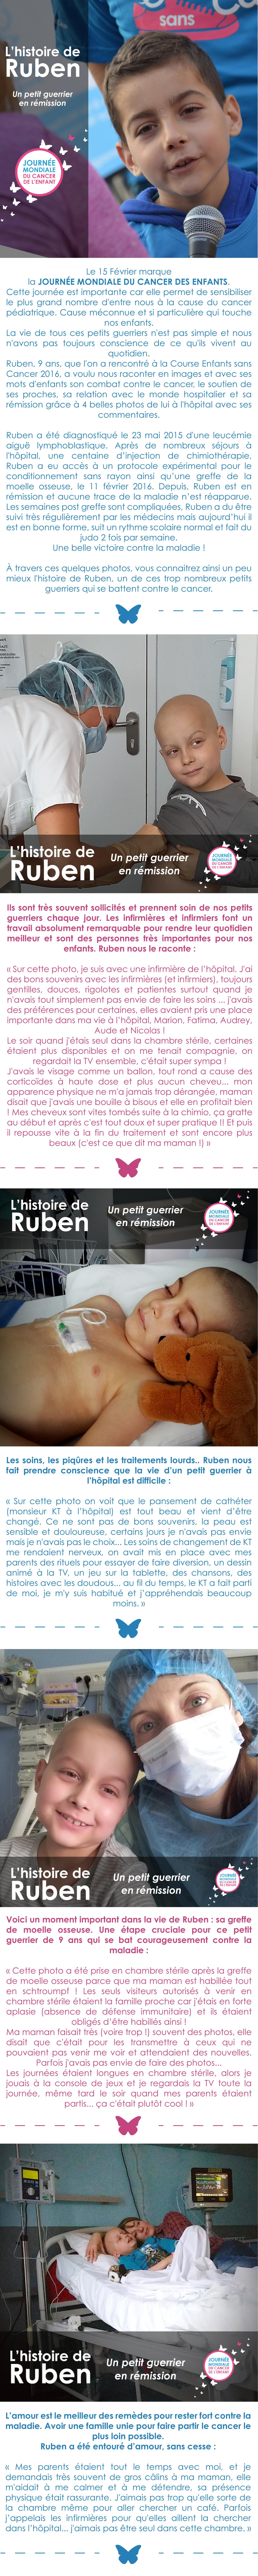 story Ruben-01